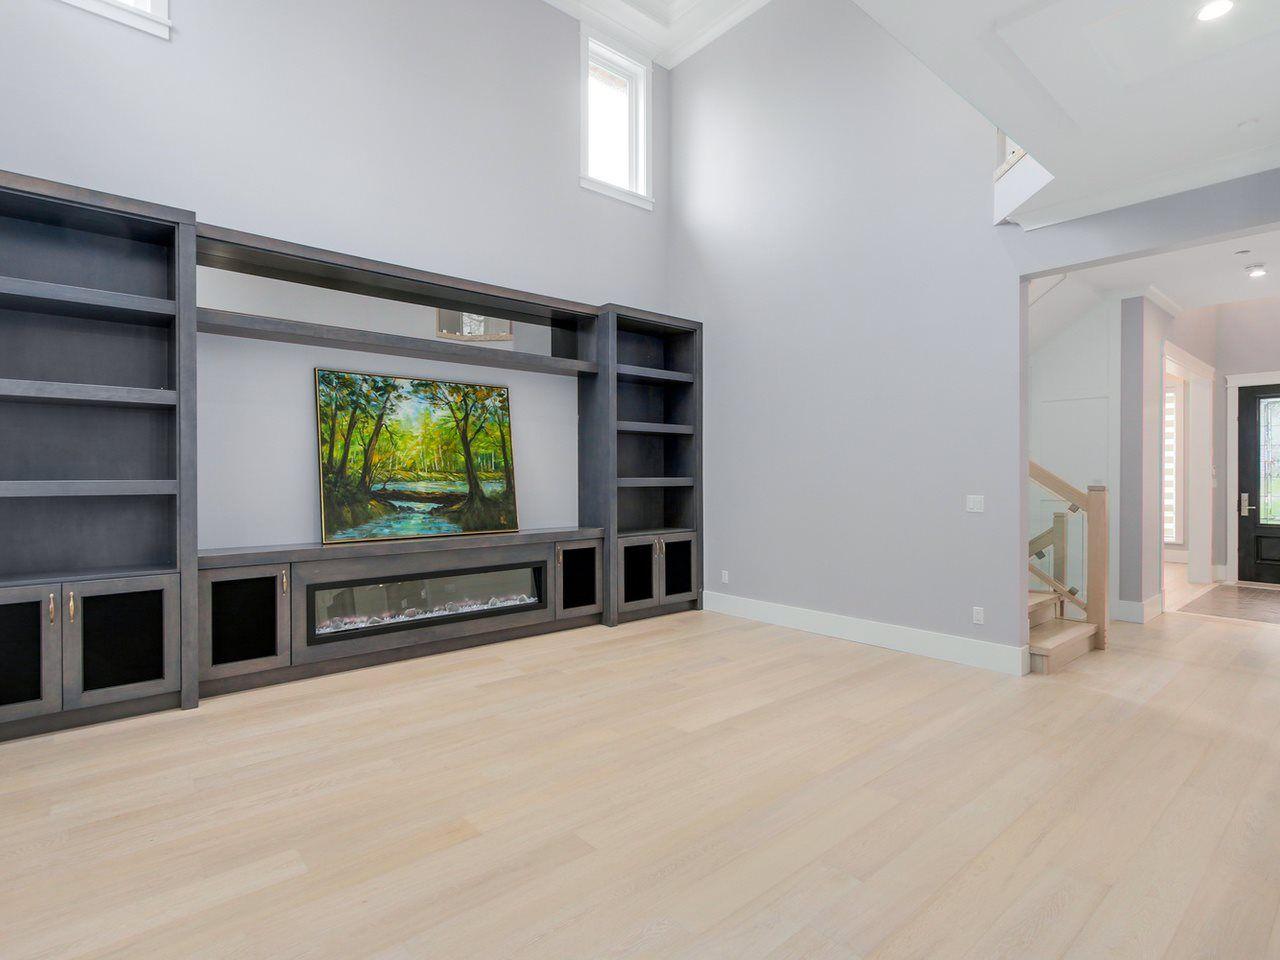 Photo 11: Photos: 1560 MAPLE Street: White Rock House for sale (South Surrey White Rock)  : MLS®# R2138926